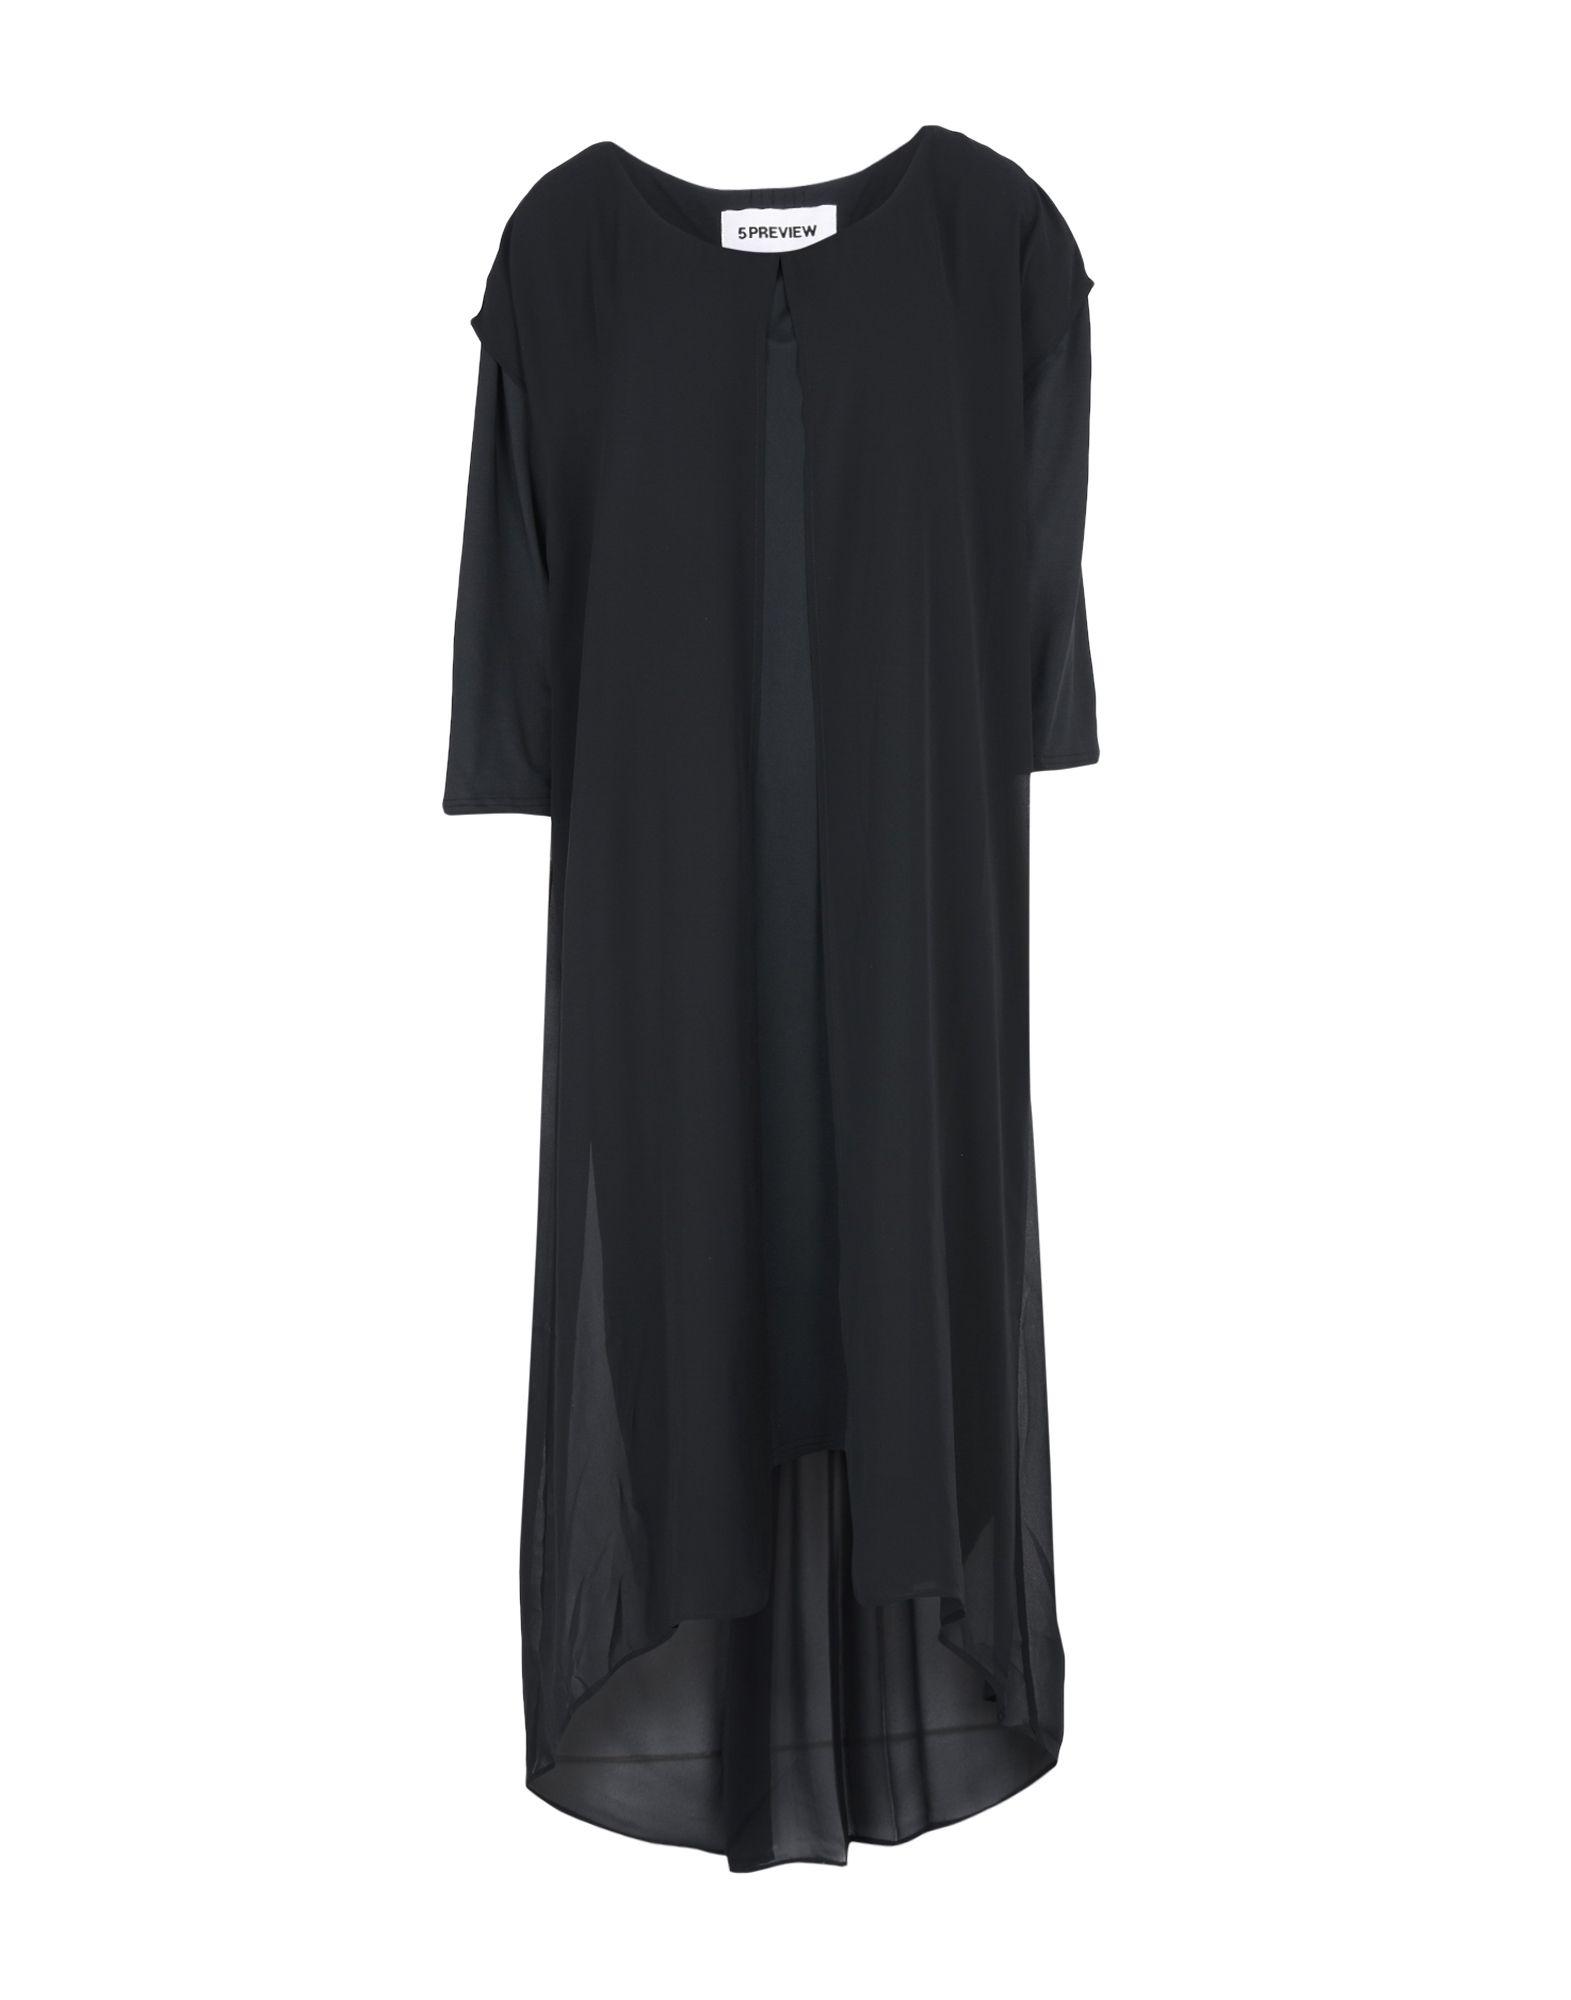 5PREVIEW Платье длиной 3/4 lisa corti платье длиной 3 4